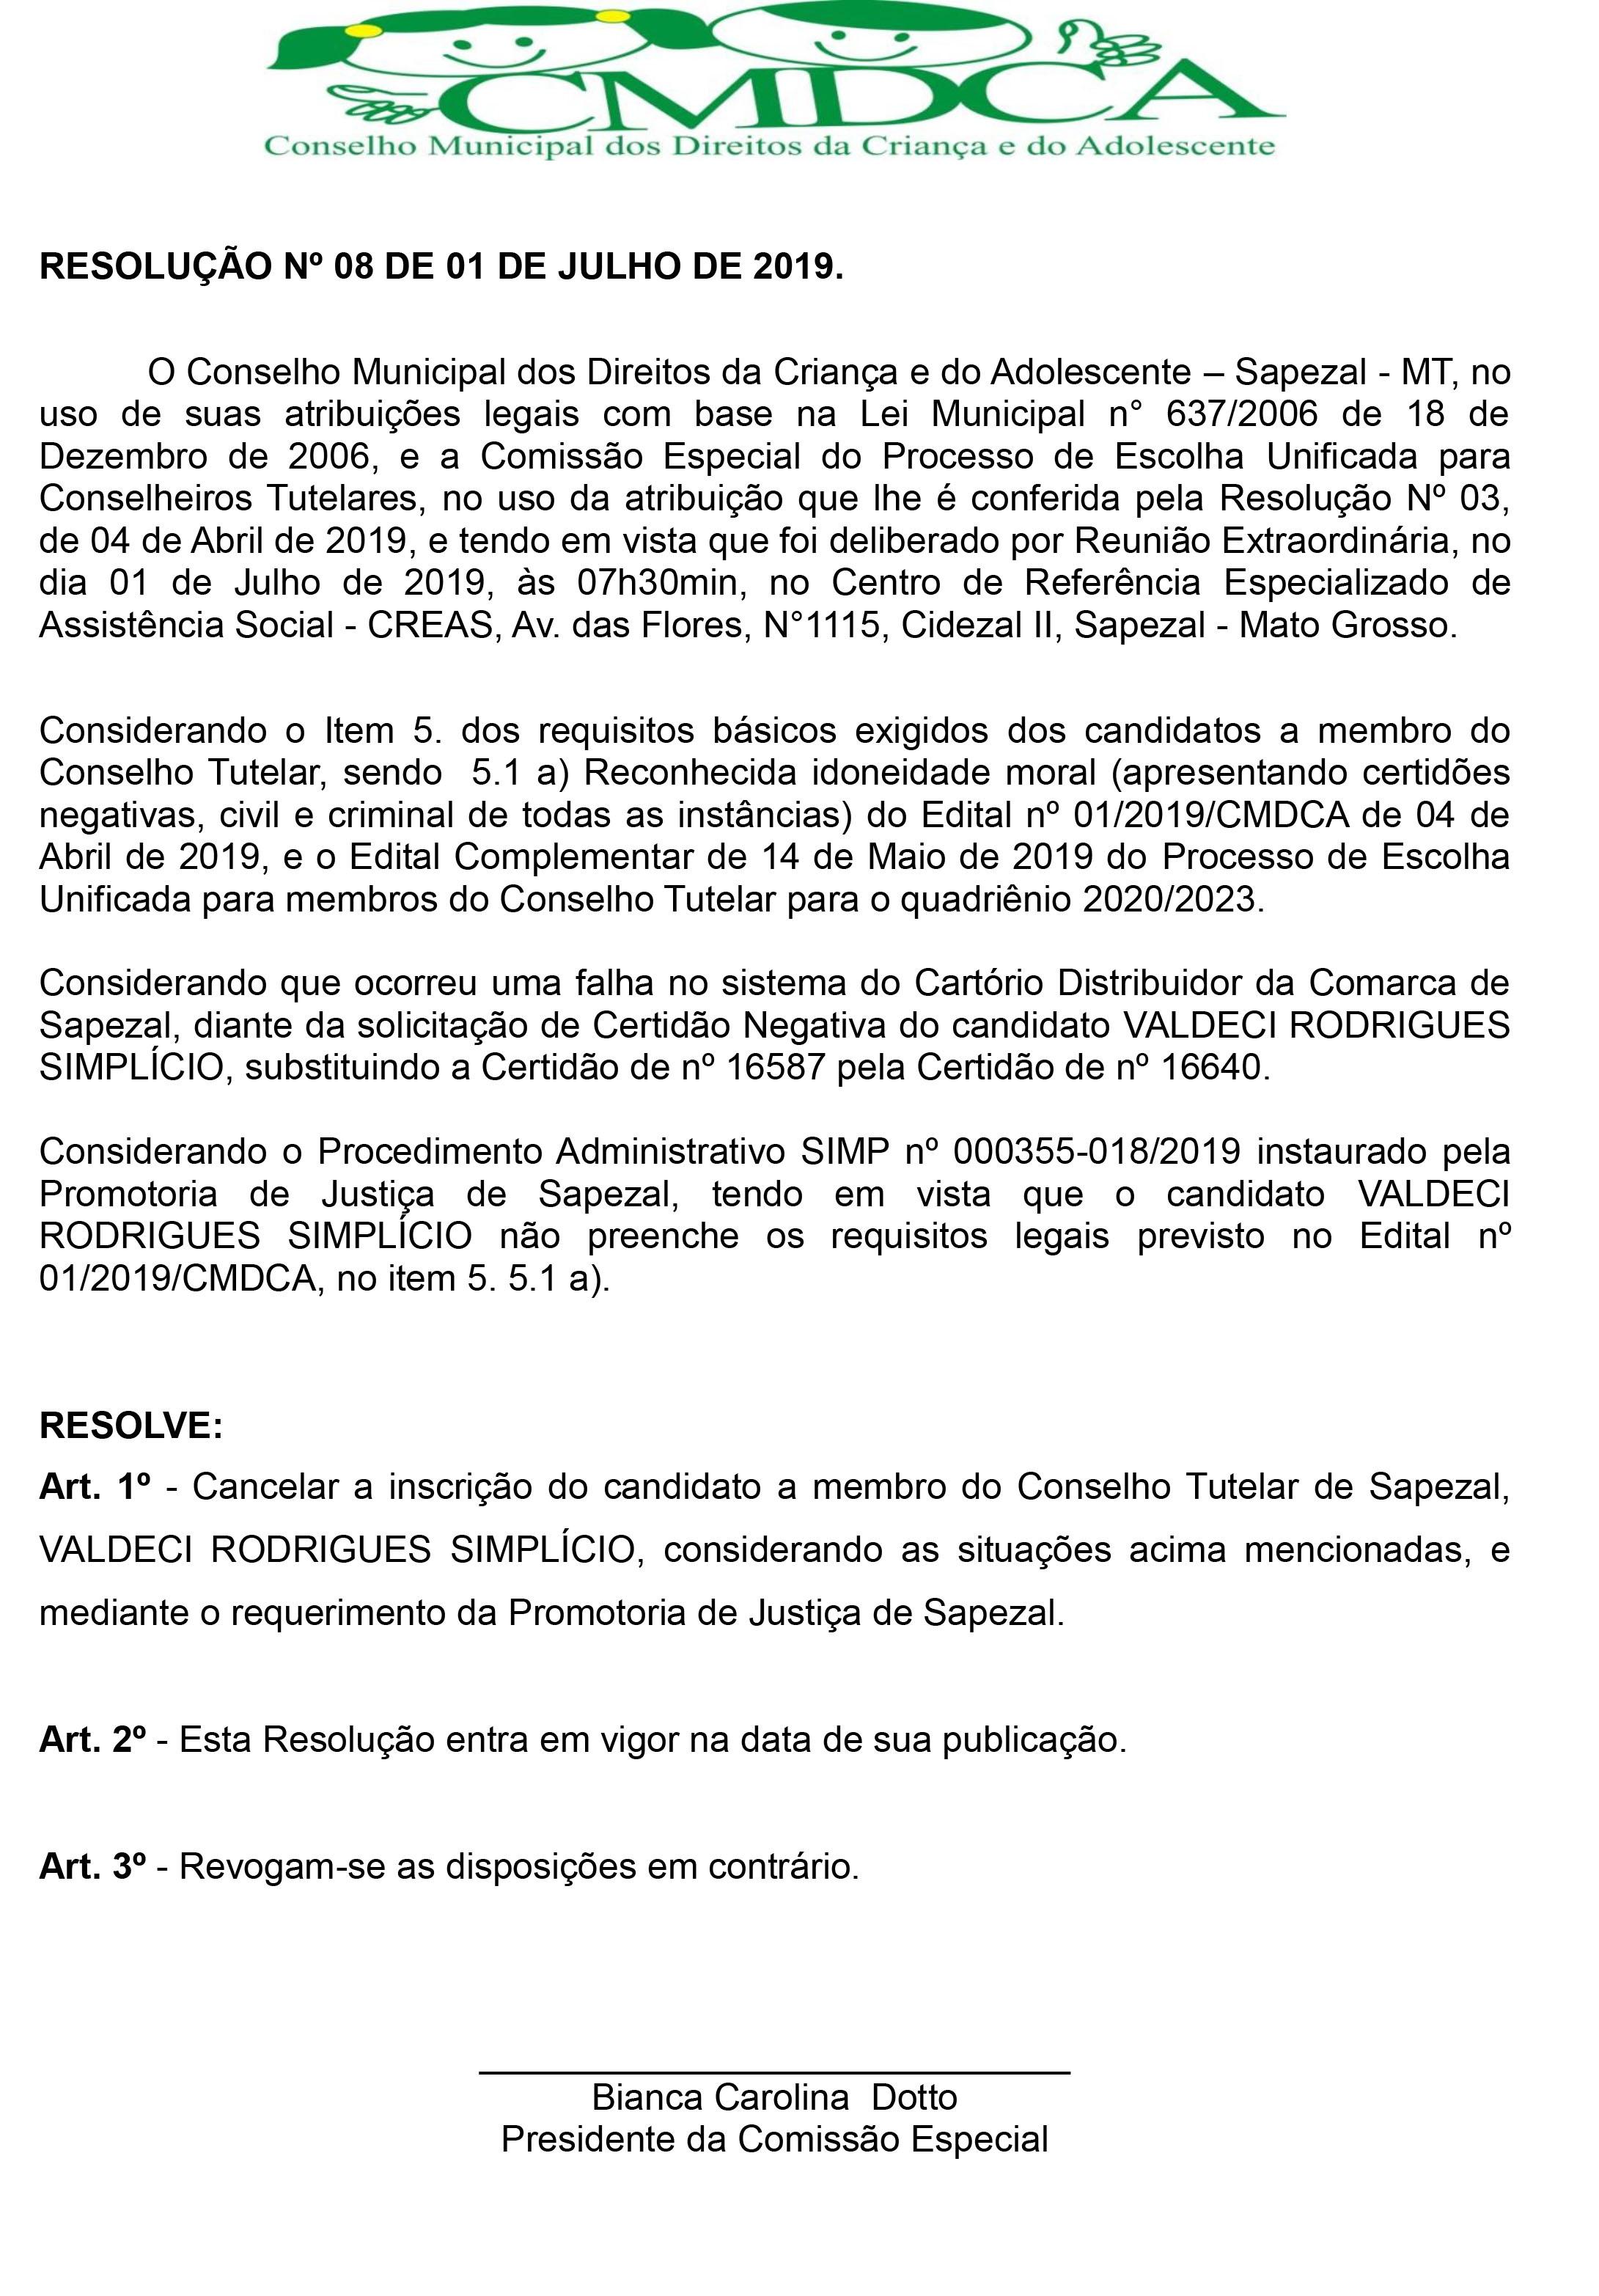 RESOLUÇÃO Nº 08 - 2019